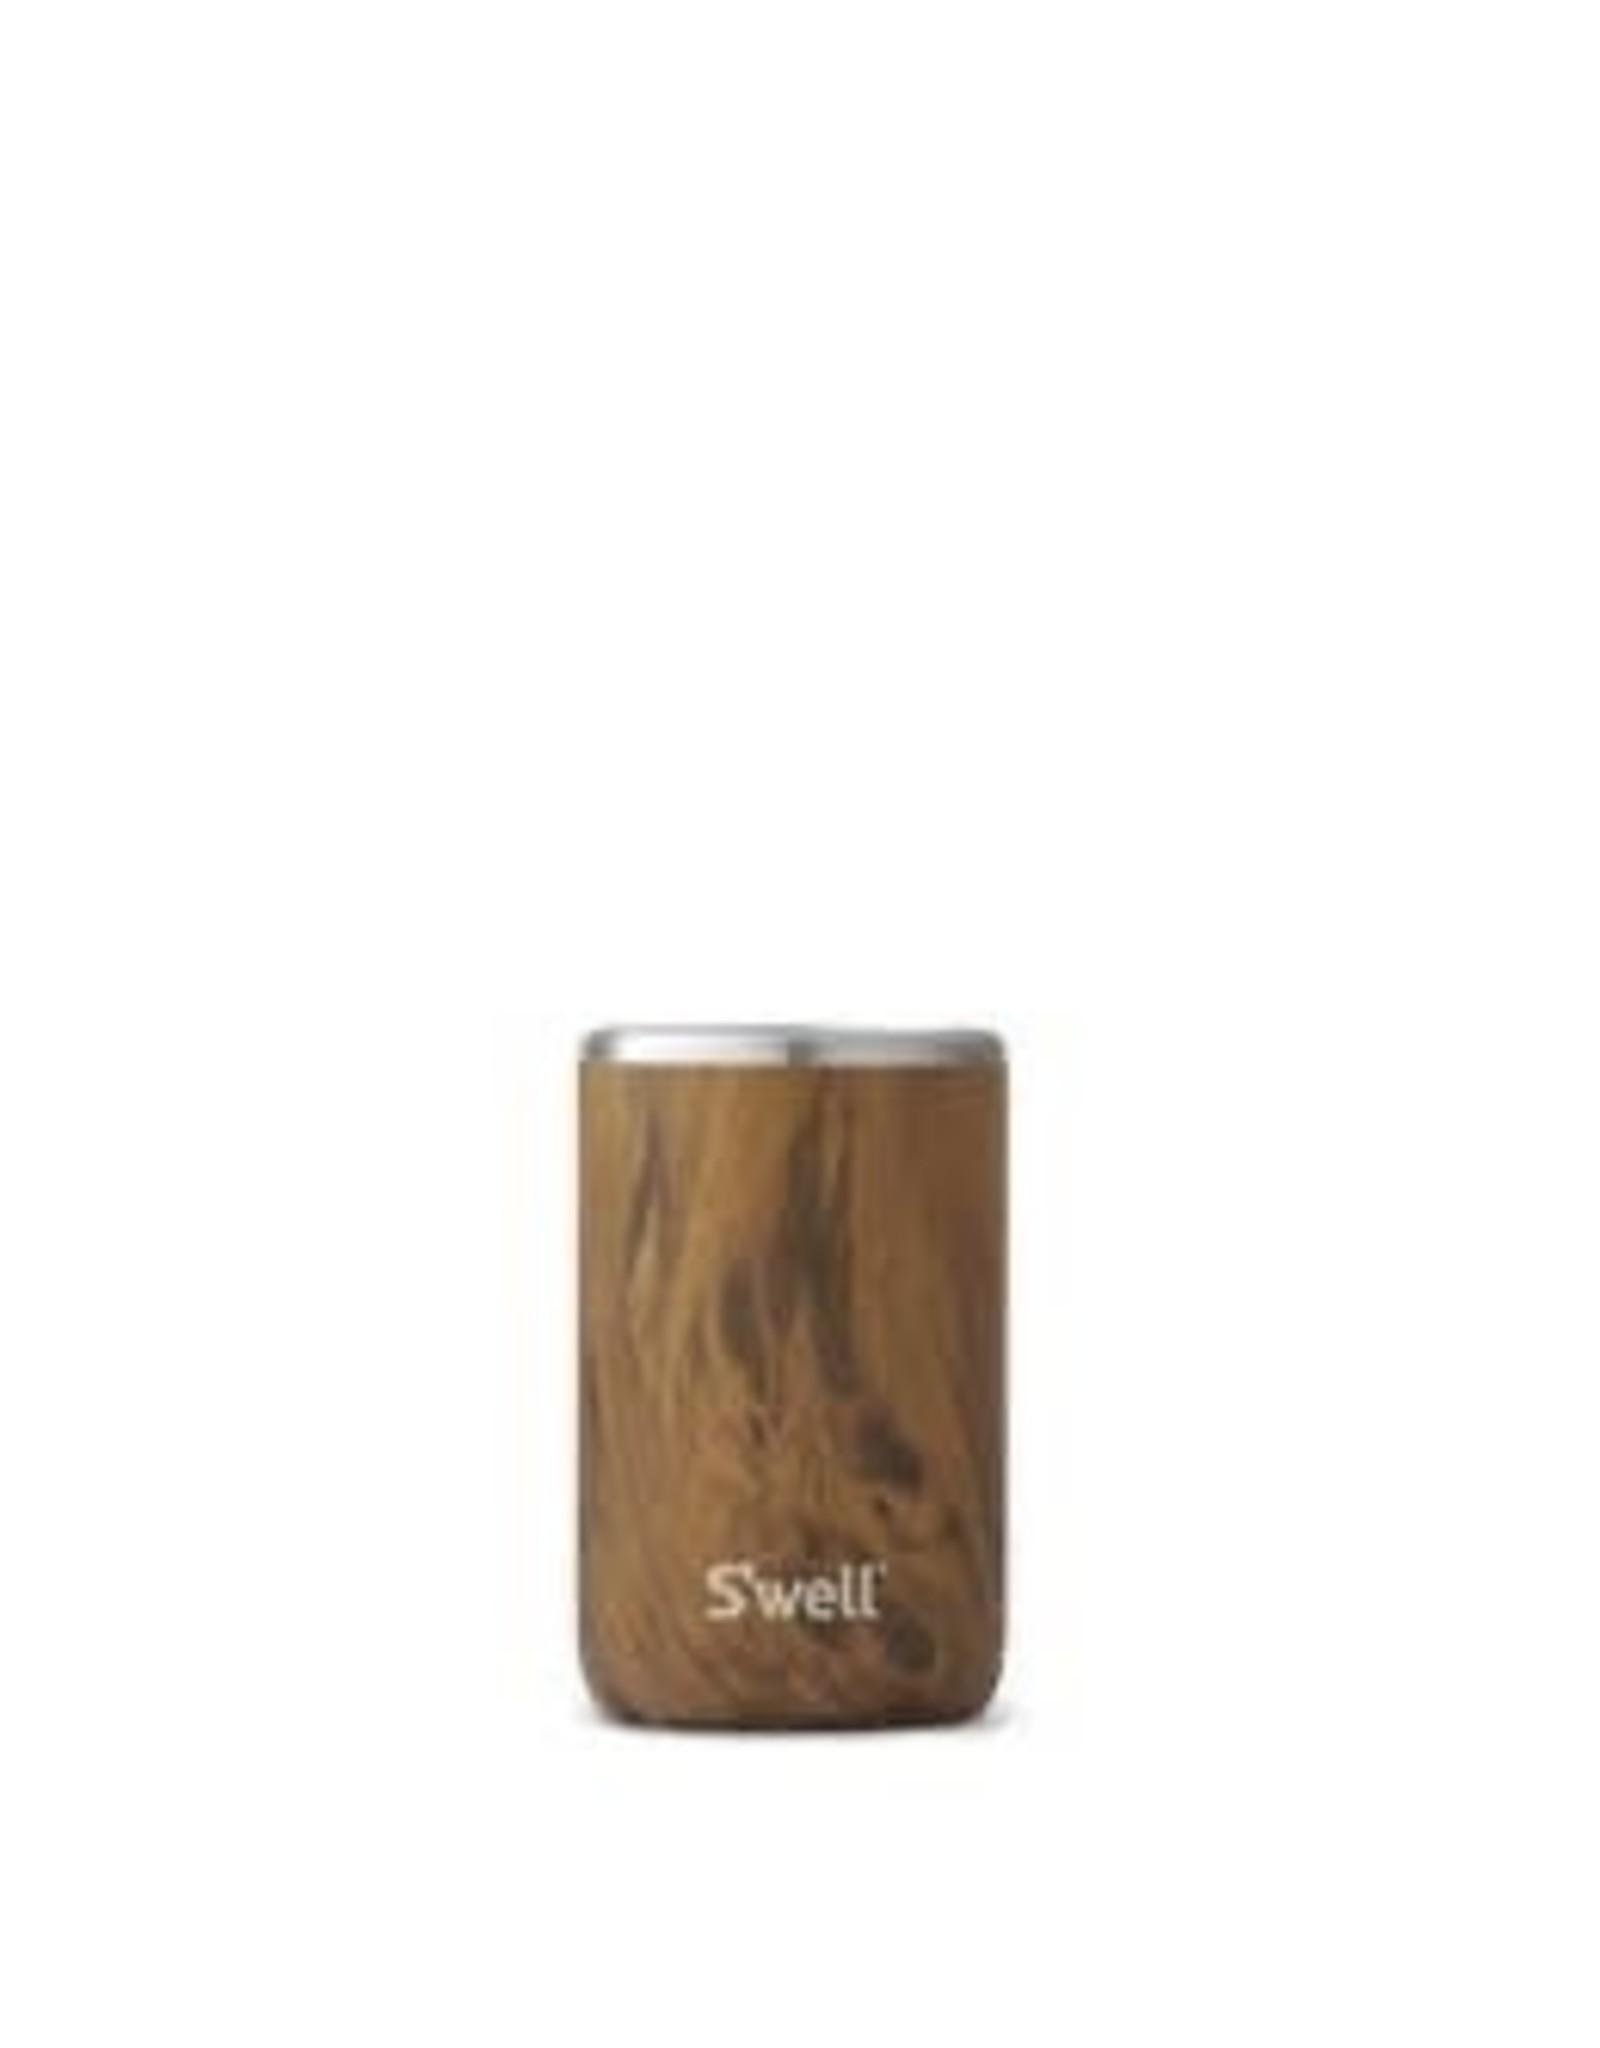 Swell Stainless Steel Drink Chiller 12oz - Teakwood